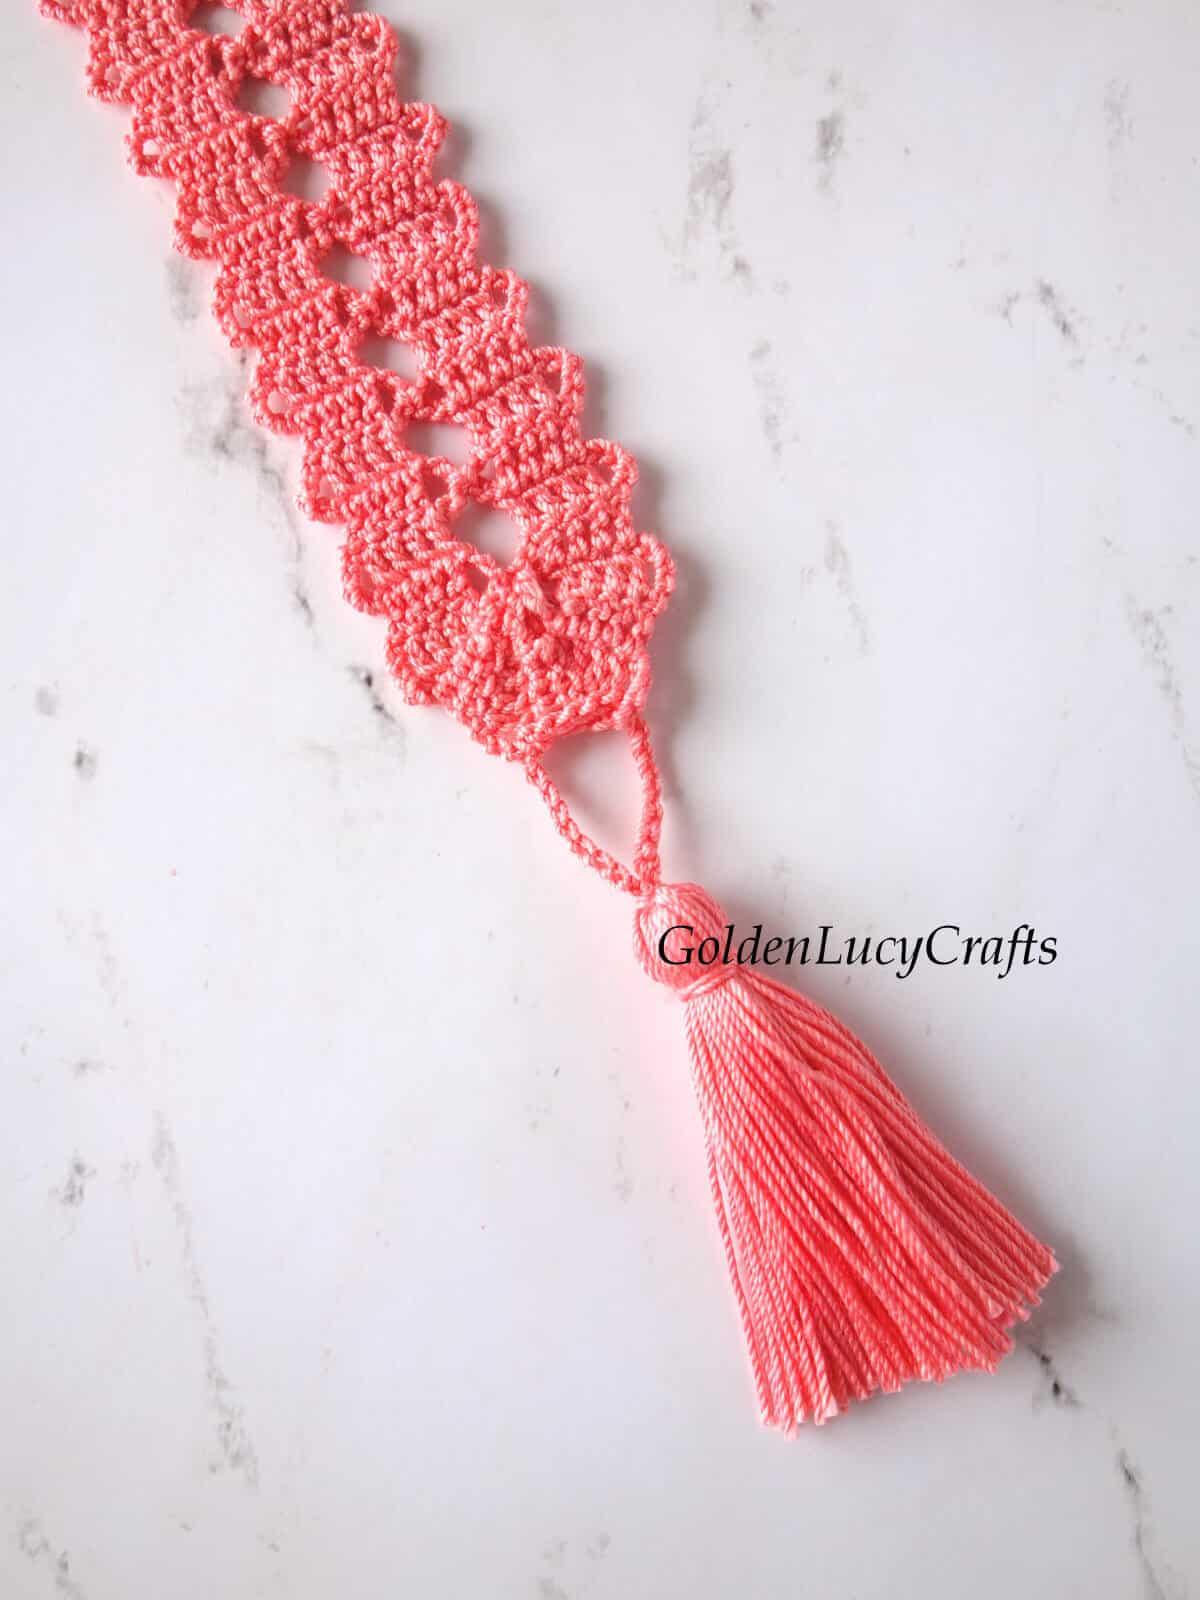 Crochet bookmark tassel close up picture.